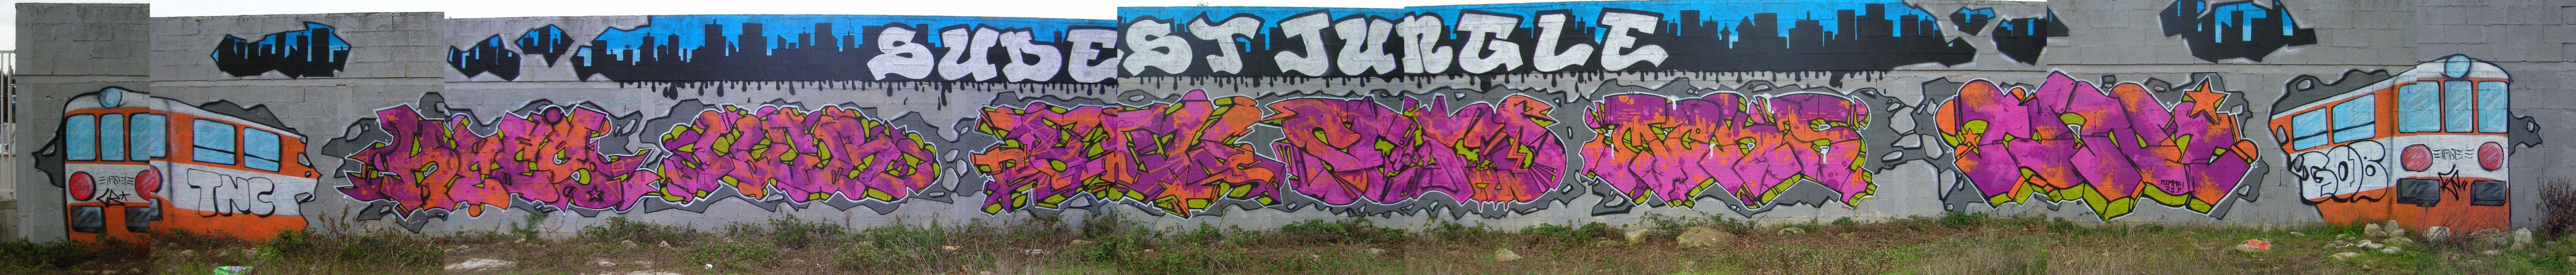 Kees + Uor + OneBlow + Sard + Meks + Tony